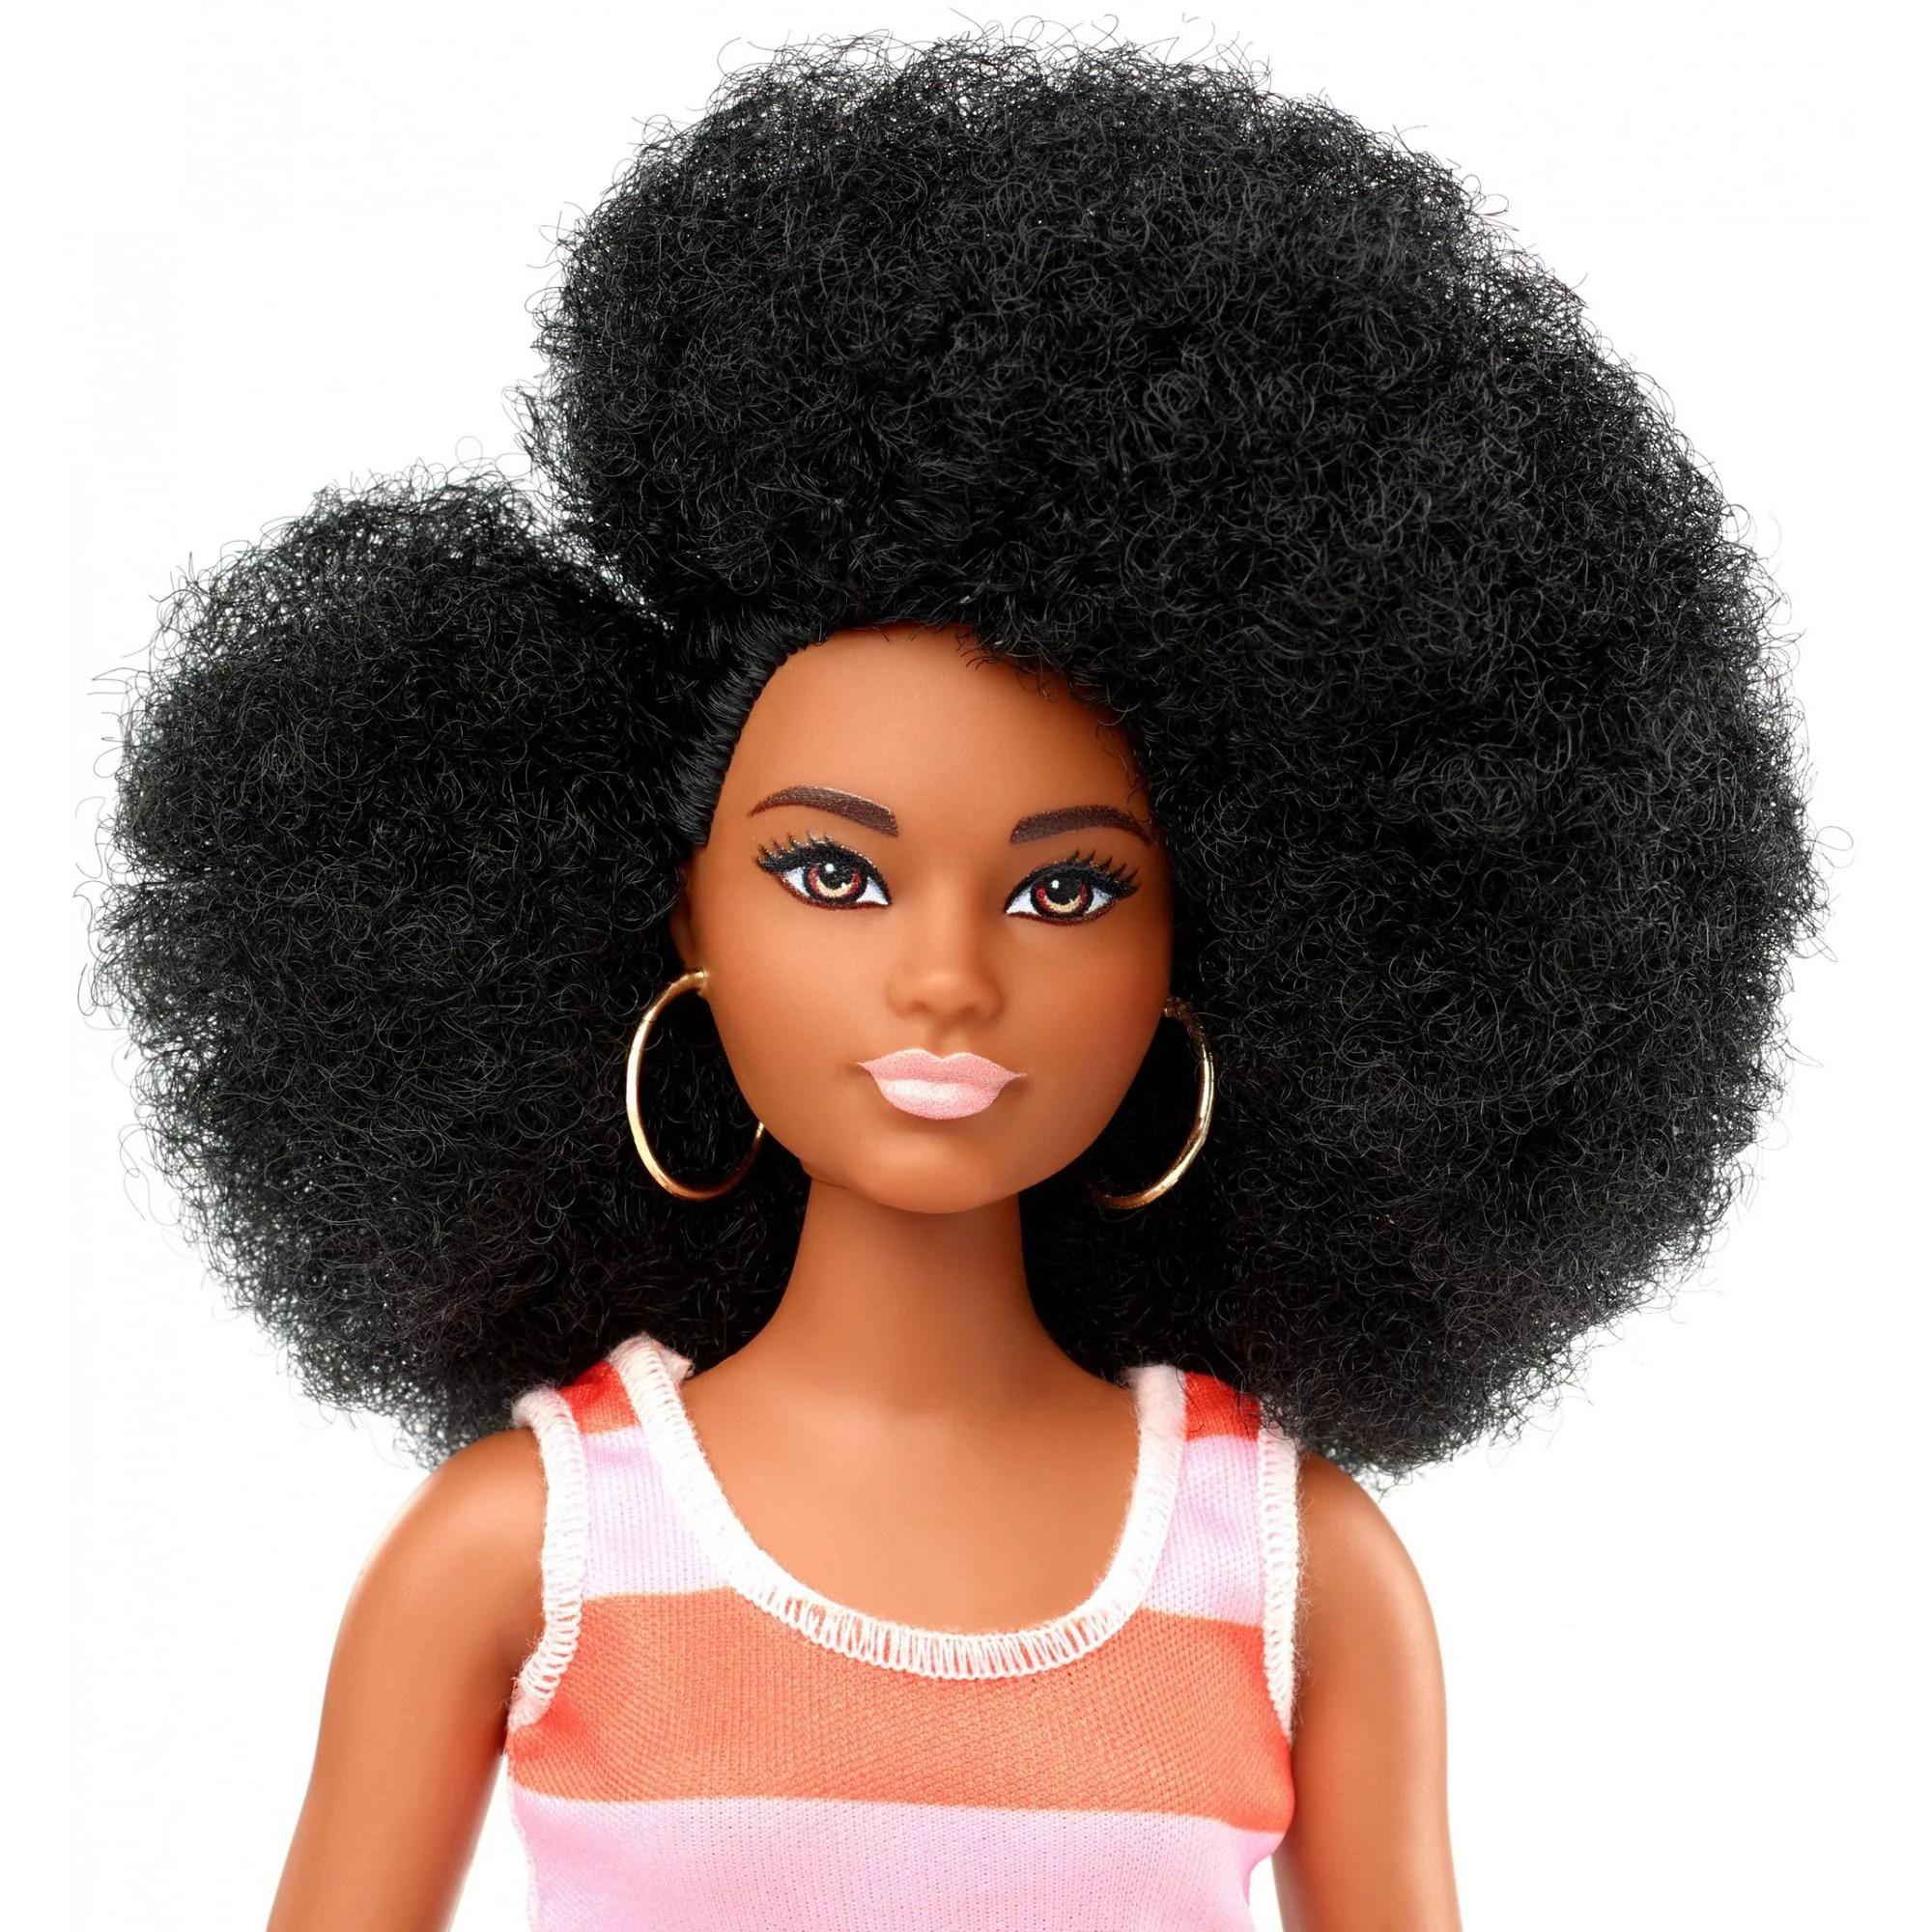 Barbie Fashionistas Doll Curvy Body Type With Stripe Cut Out